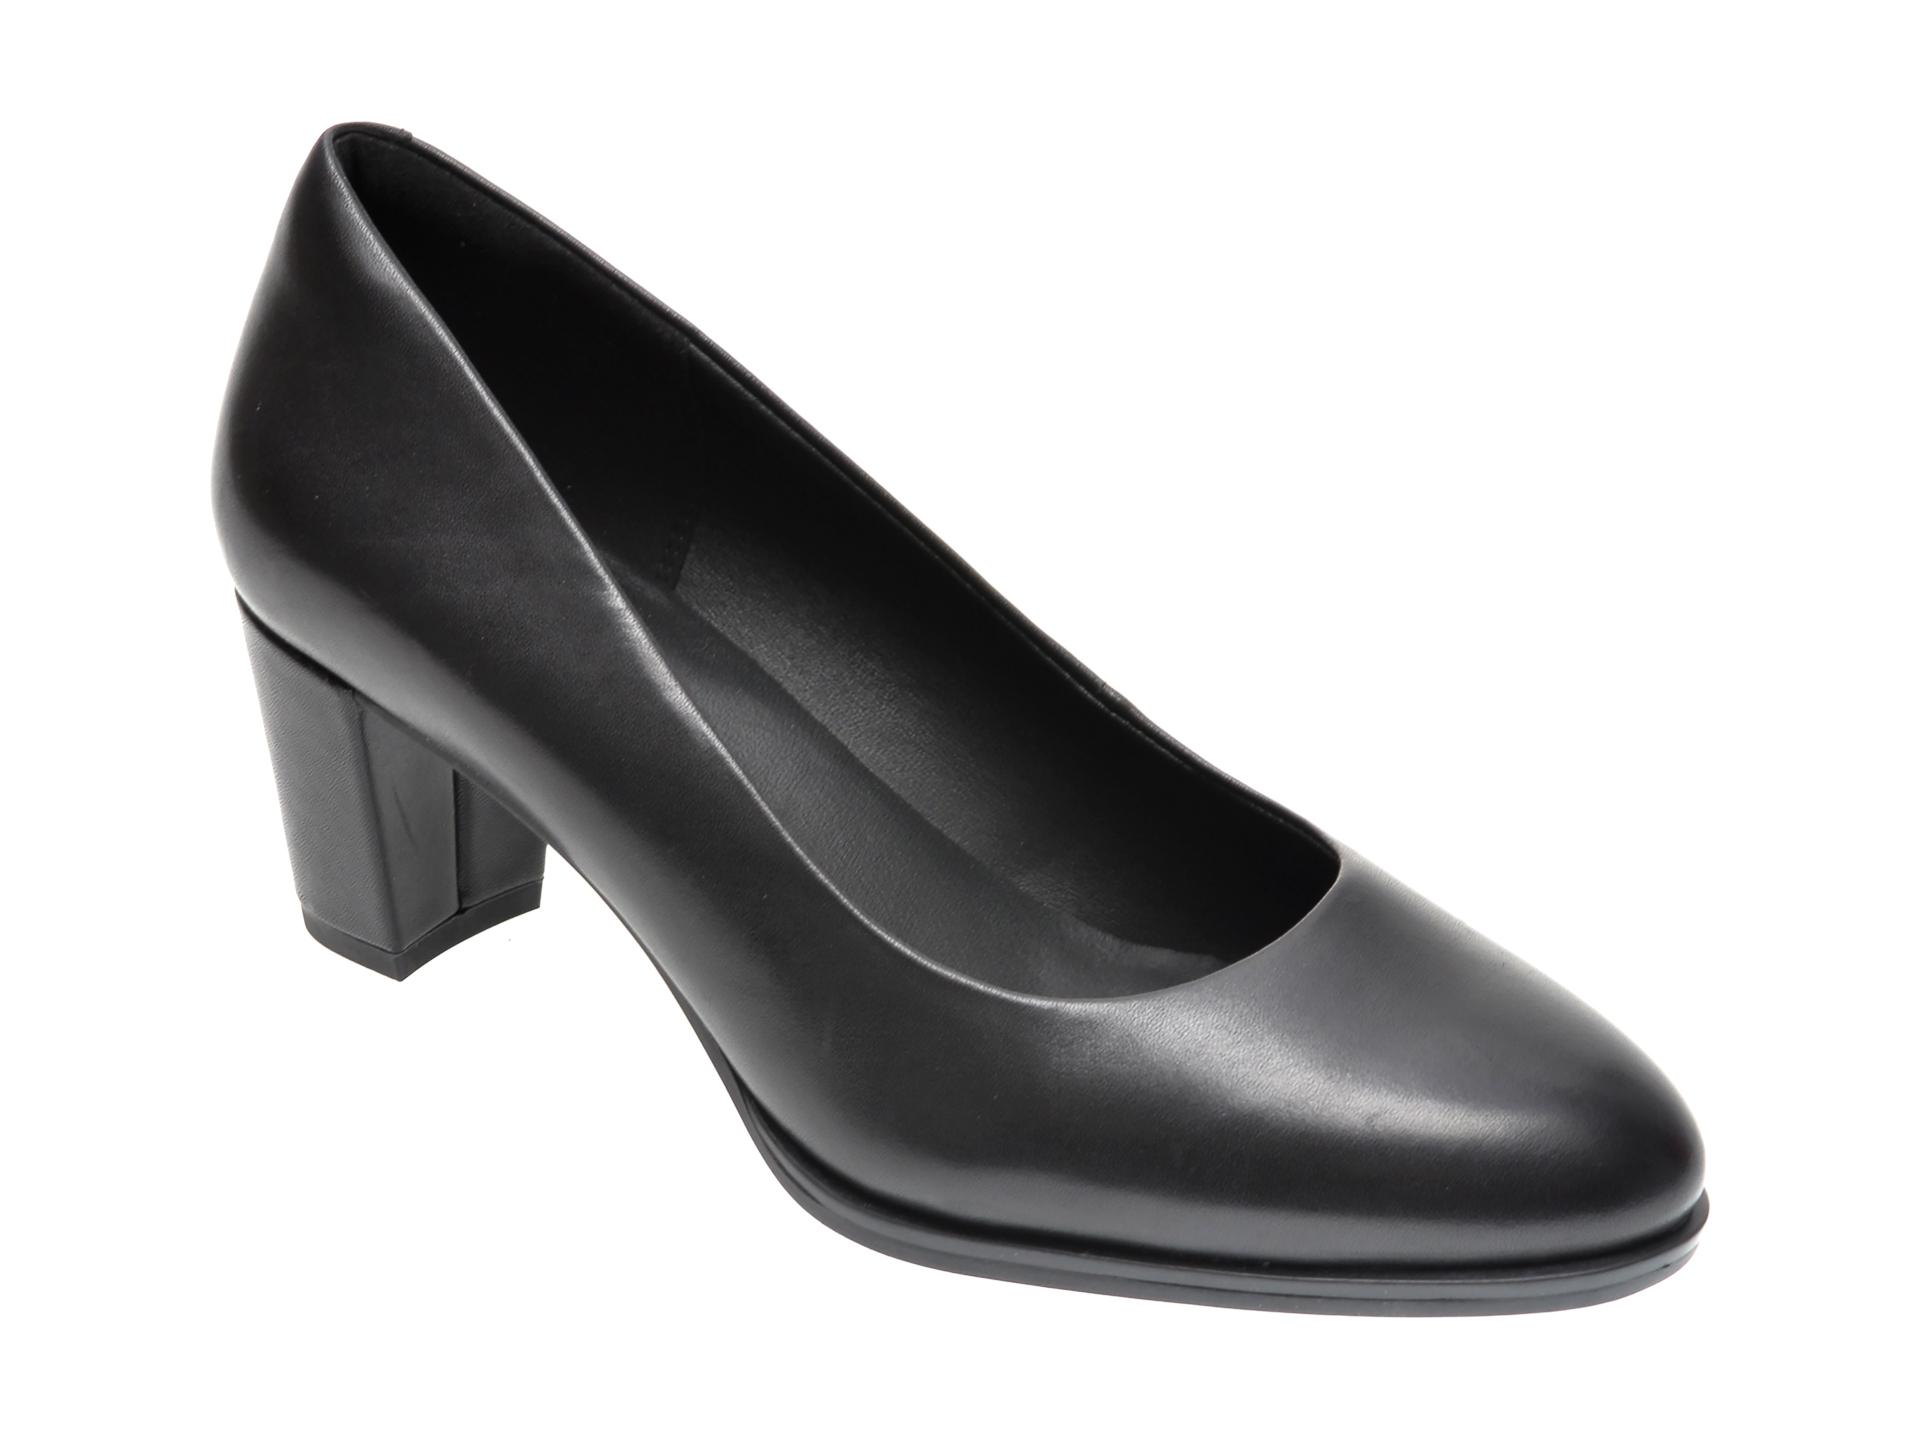 Pantofi CLARKS negri, KAYLIN60 COURT, din piele naturala imagine